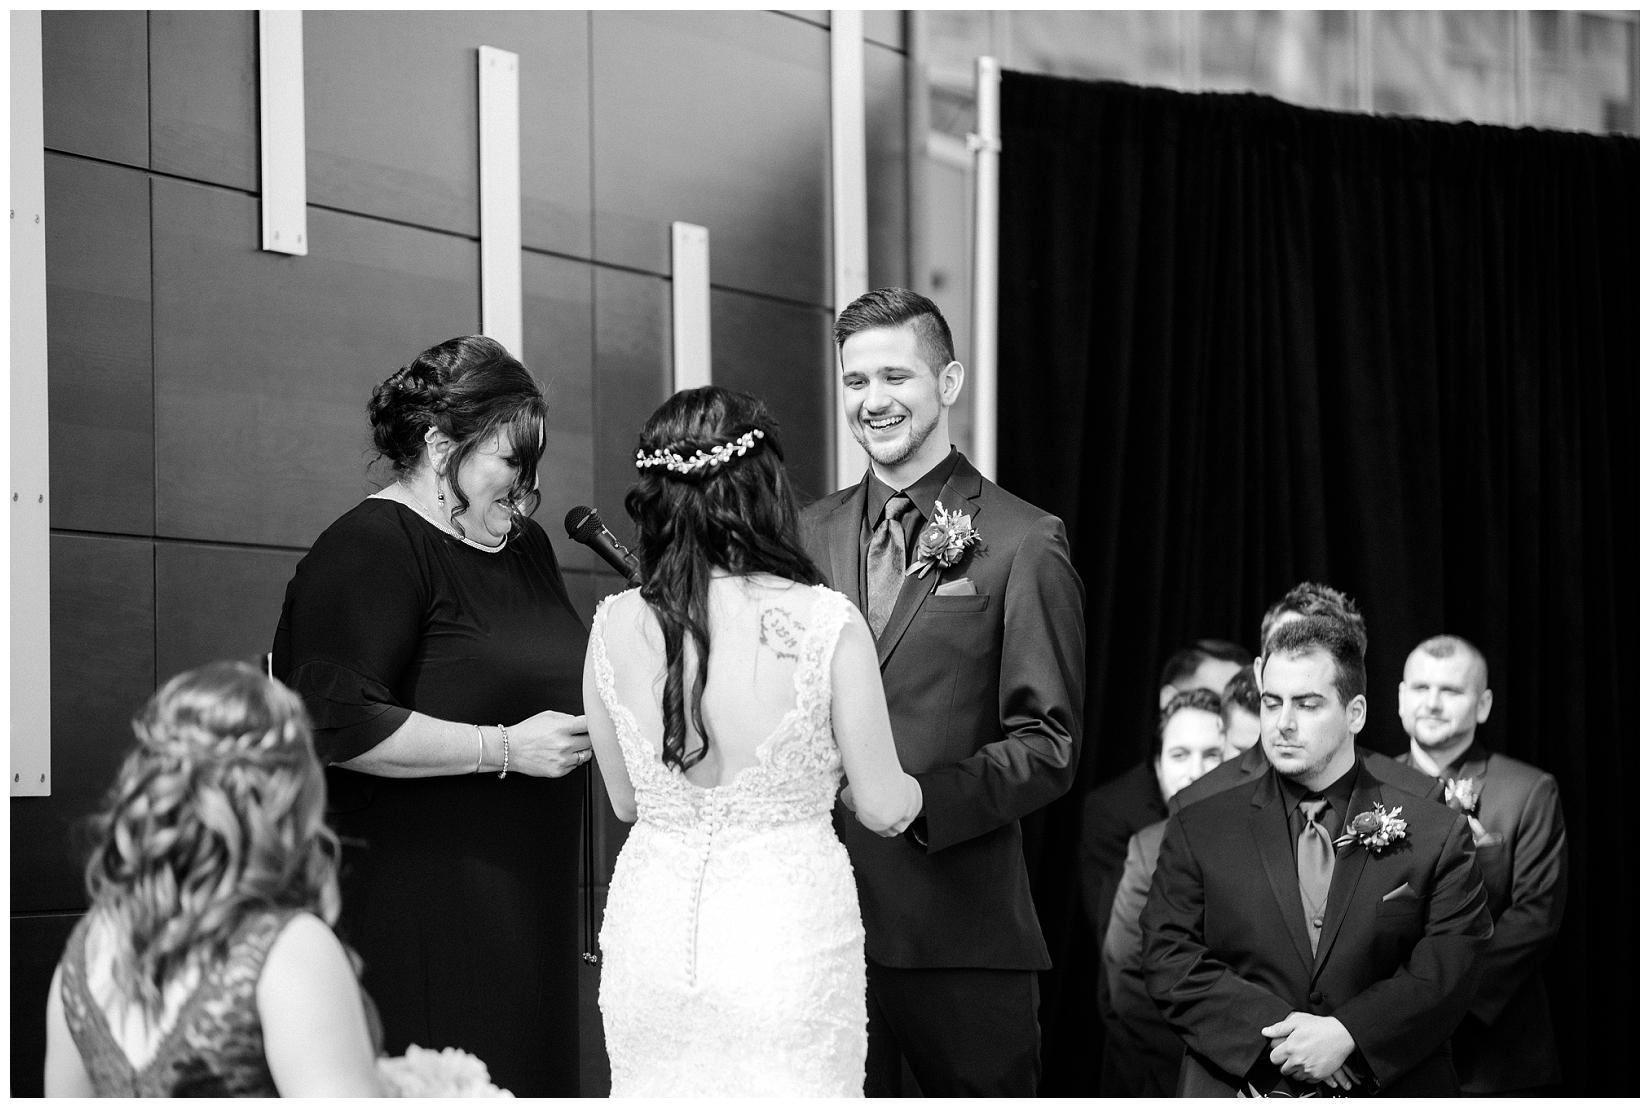 cat-alkire-wedding-photographer-indiana-chicago-indianapolis-fort-wayne_1086.jpg